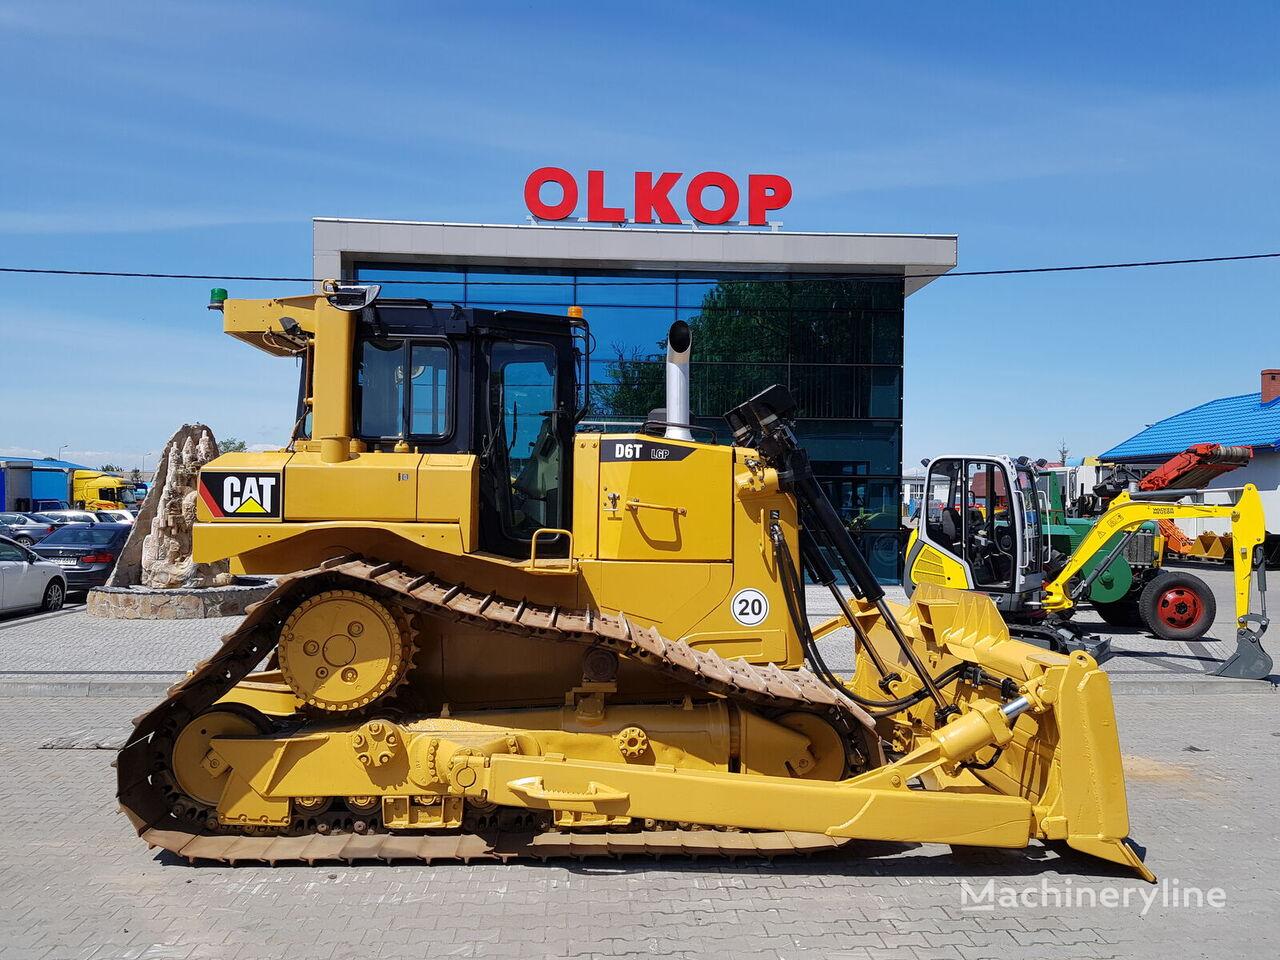 CATERPILLAR D6T LGP 22,8 t dozer / 230 HP / 4.16 m blade / perfect cond. bulldozer